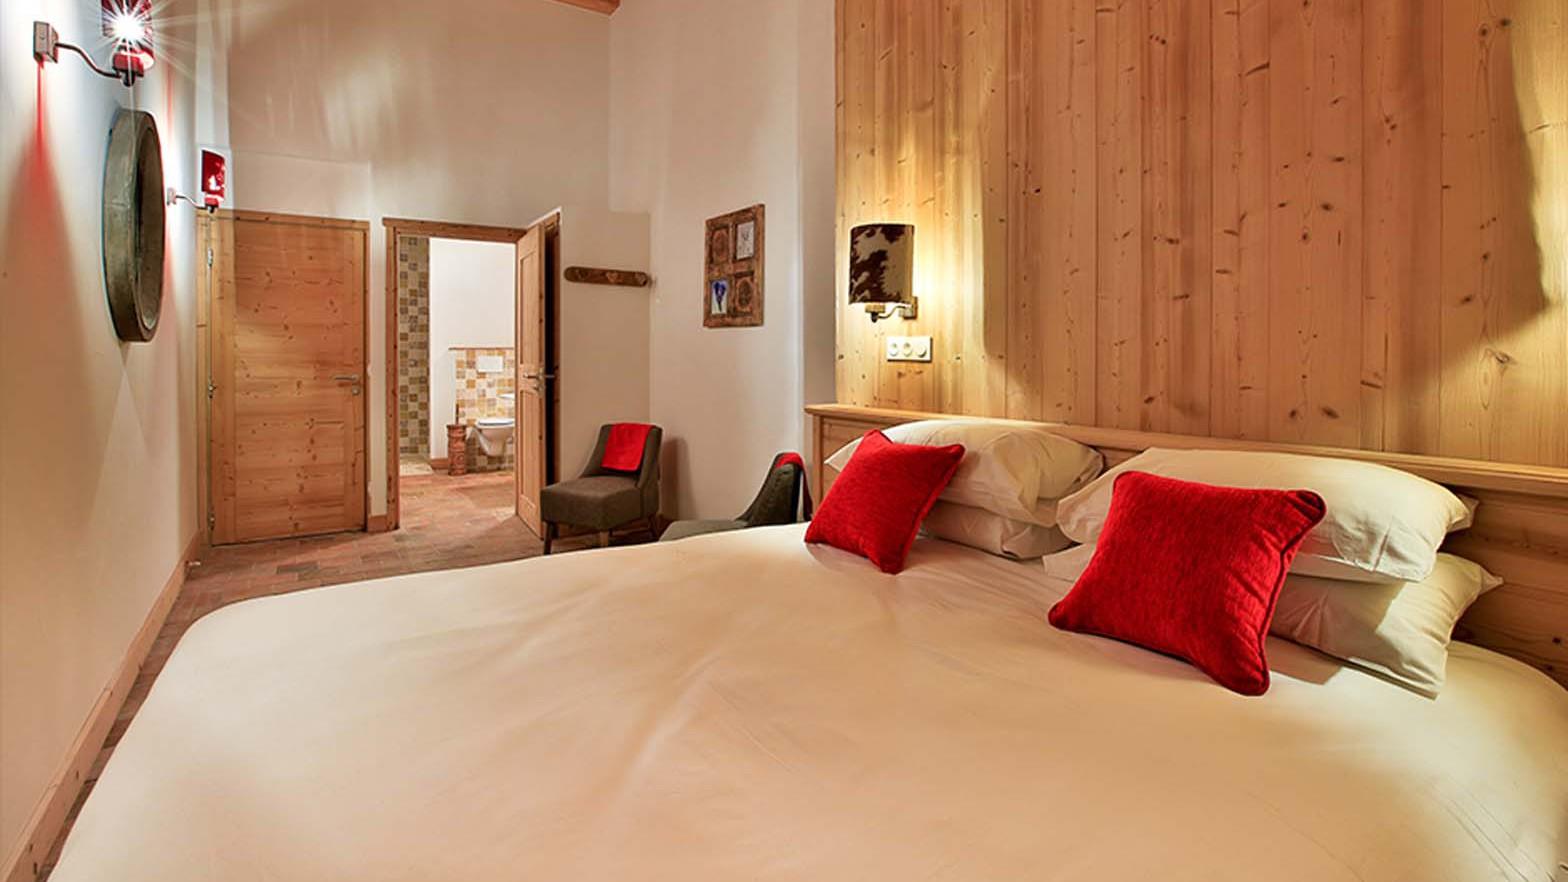 Bedroom, Chalet Silene, La Plagne, France